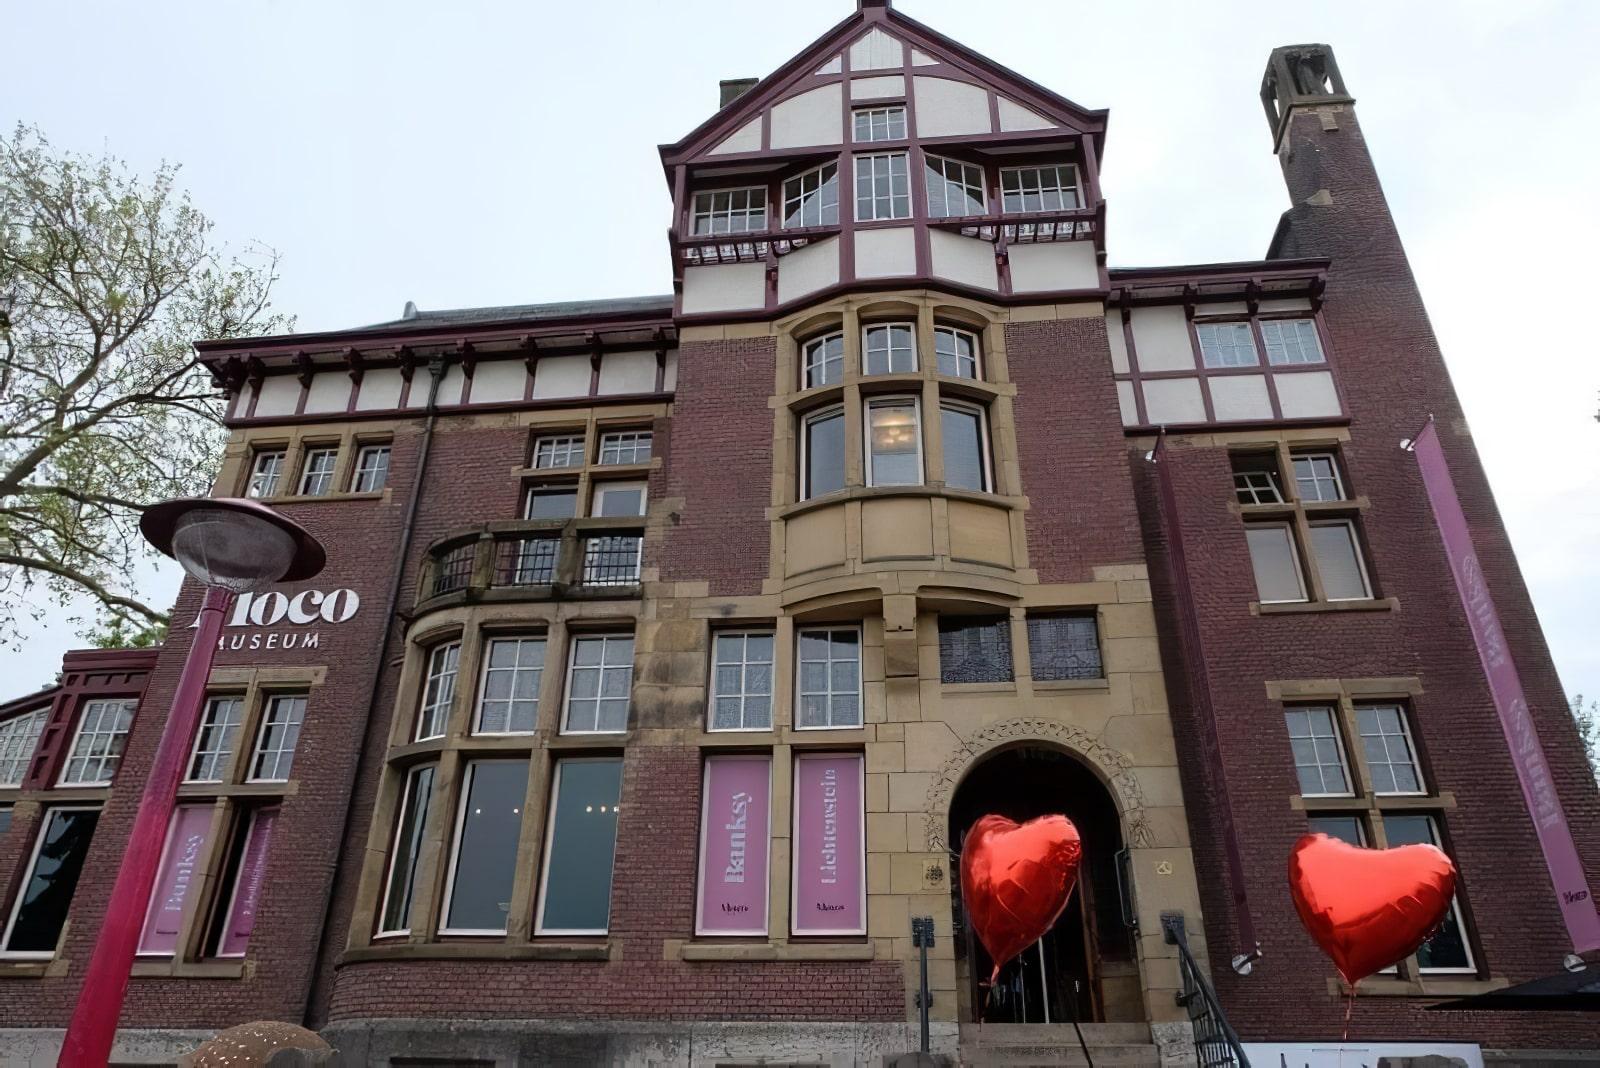 Musée Moco